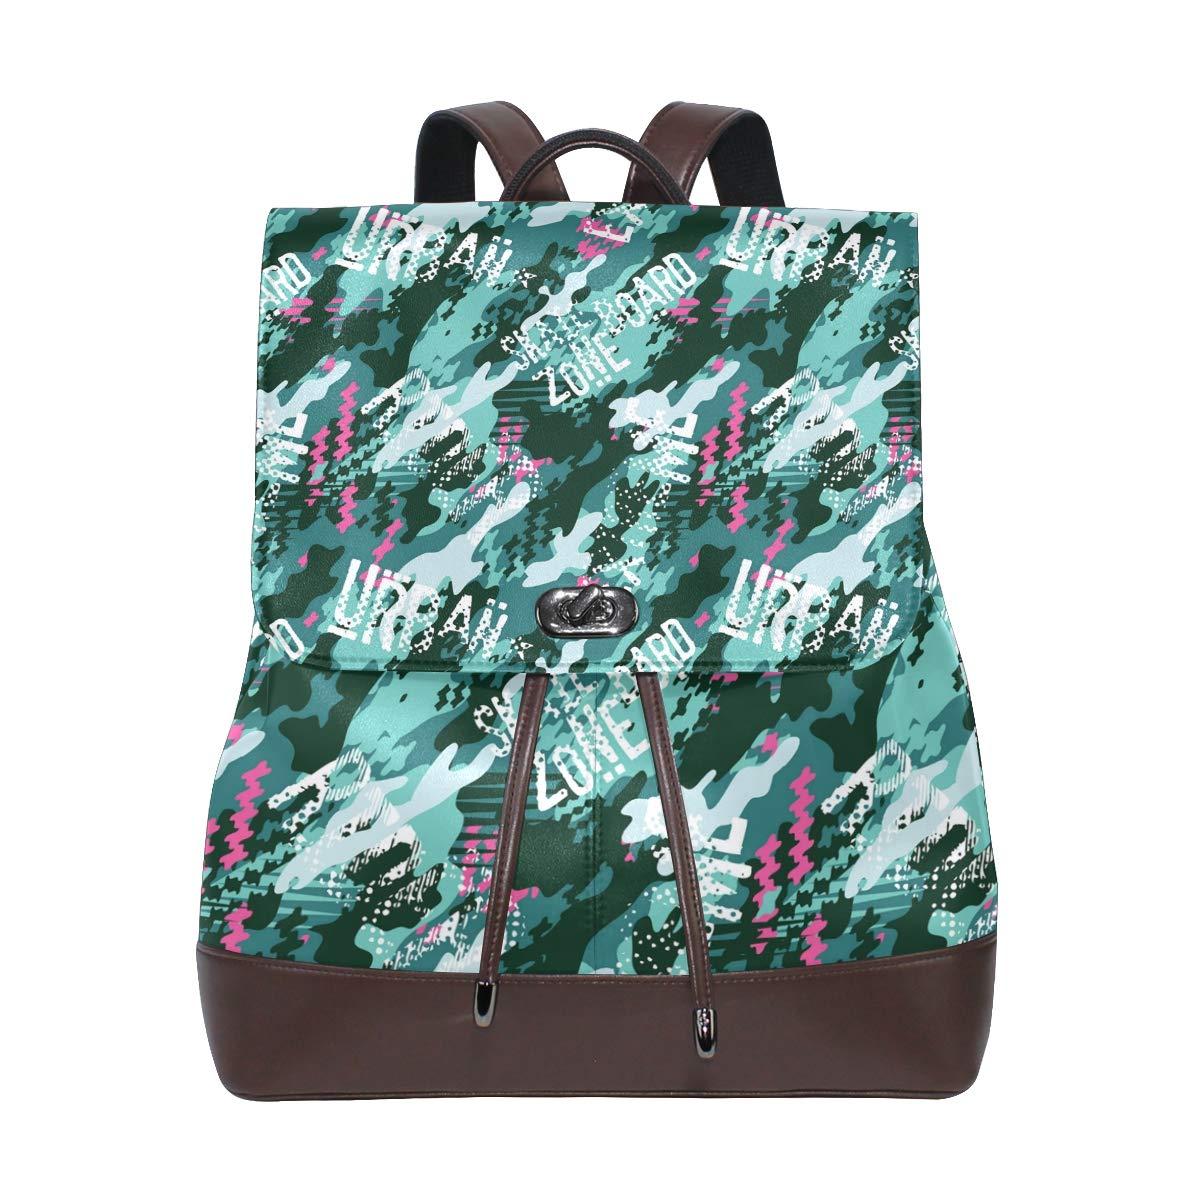 Unisex PU Leather Backpack Green Urban Camo Print Womens Casual Daypack Mens Travel Sports Bag Boys College Bookbag